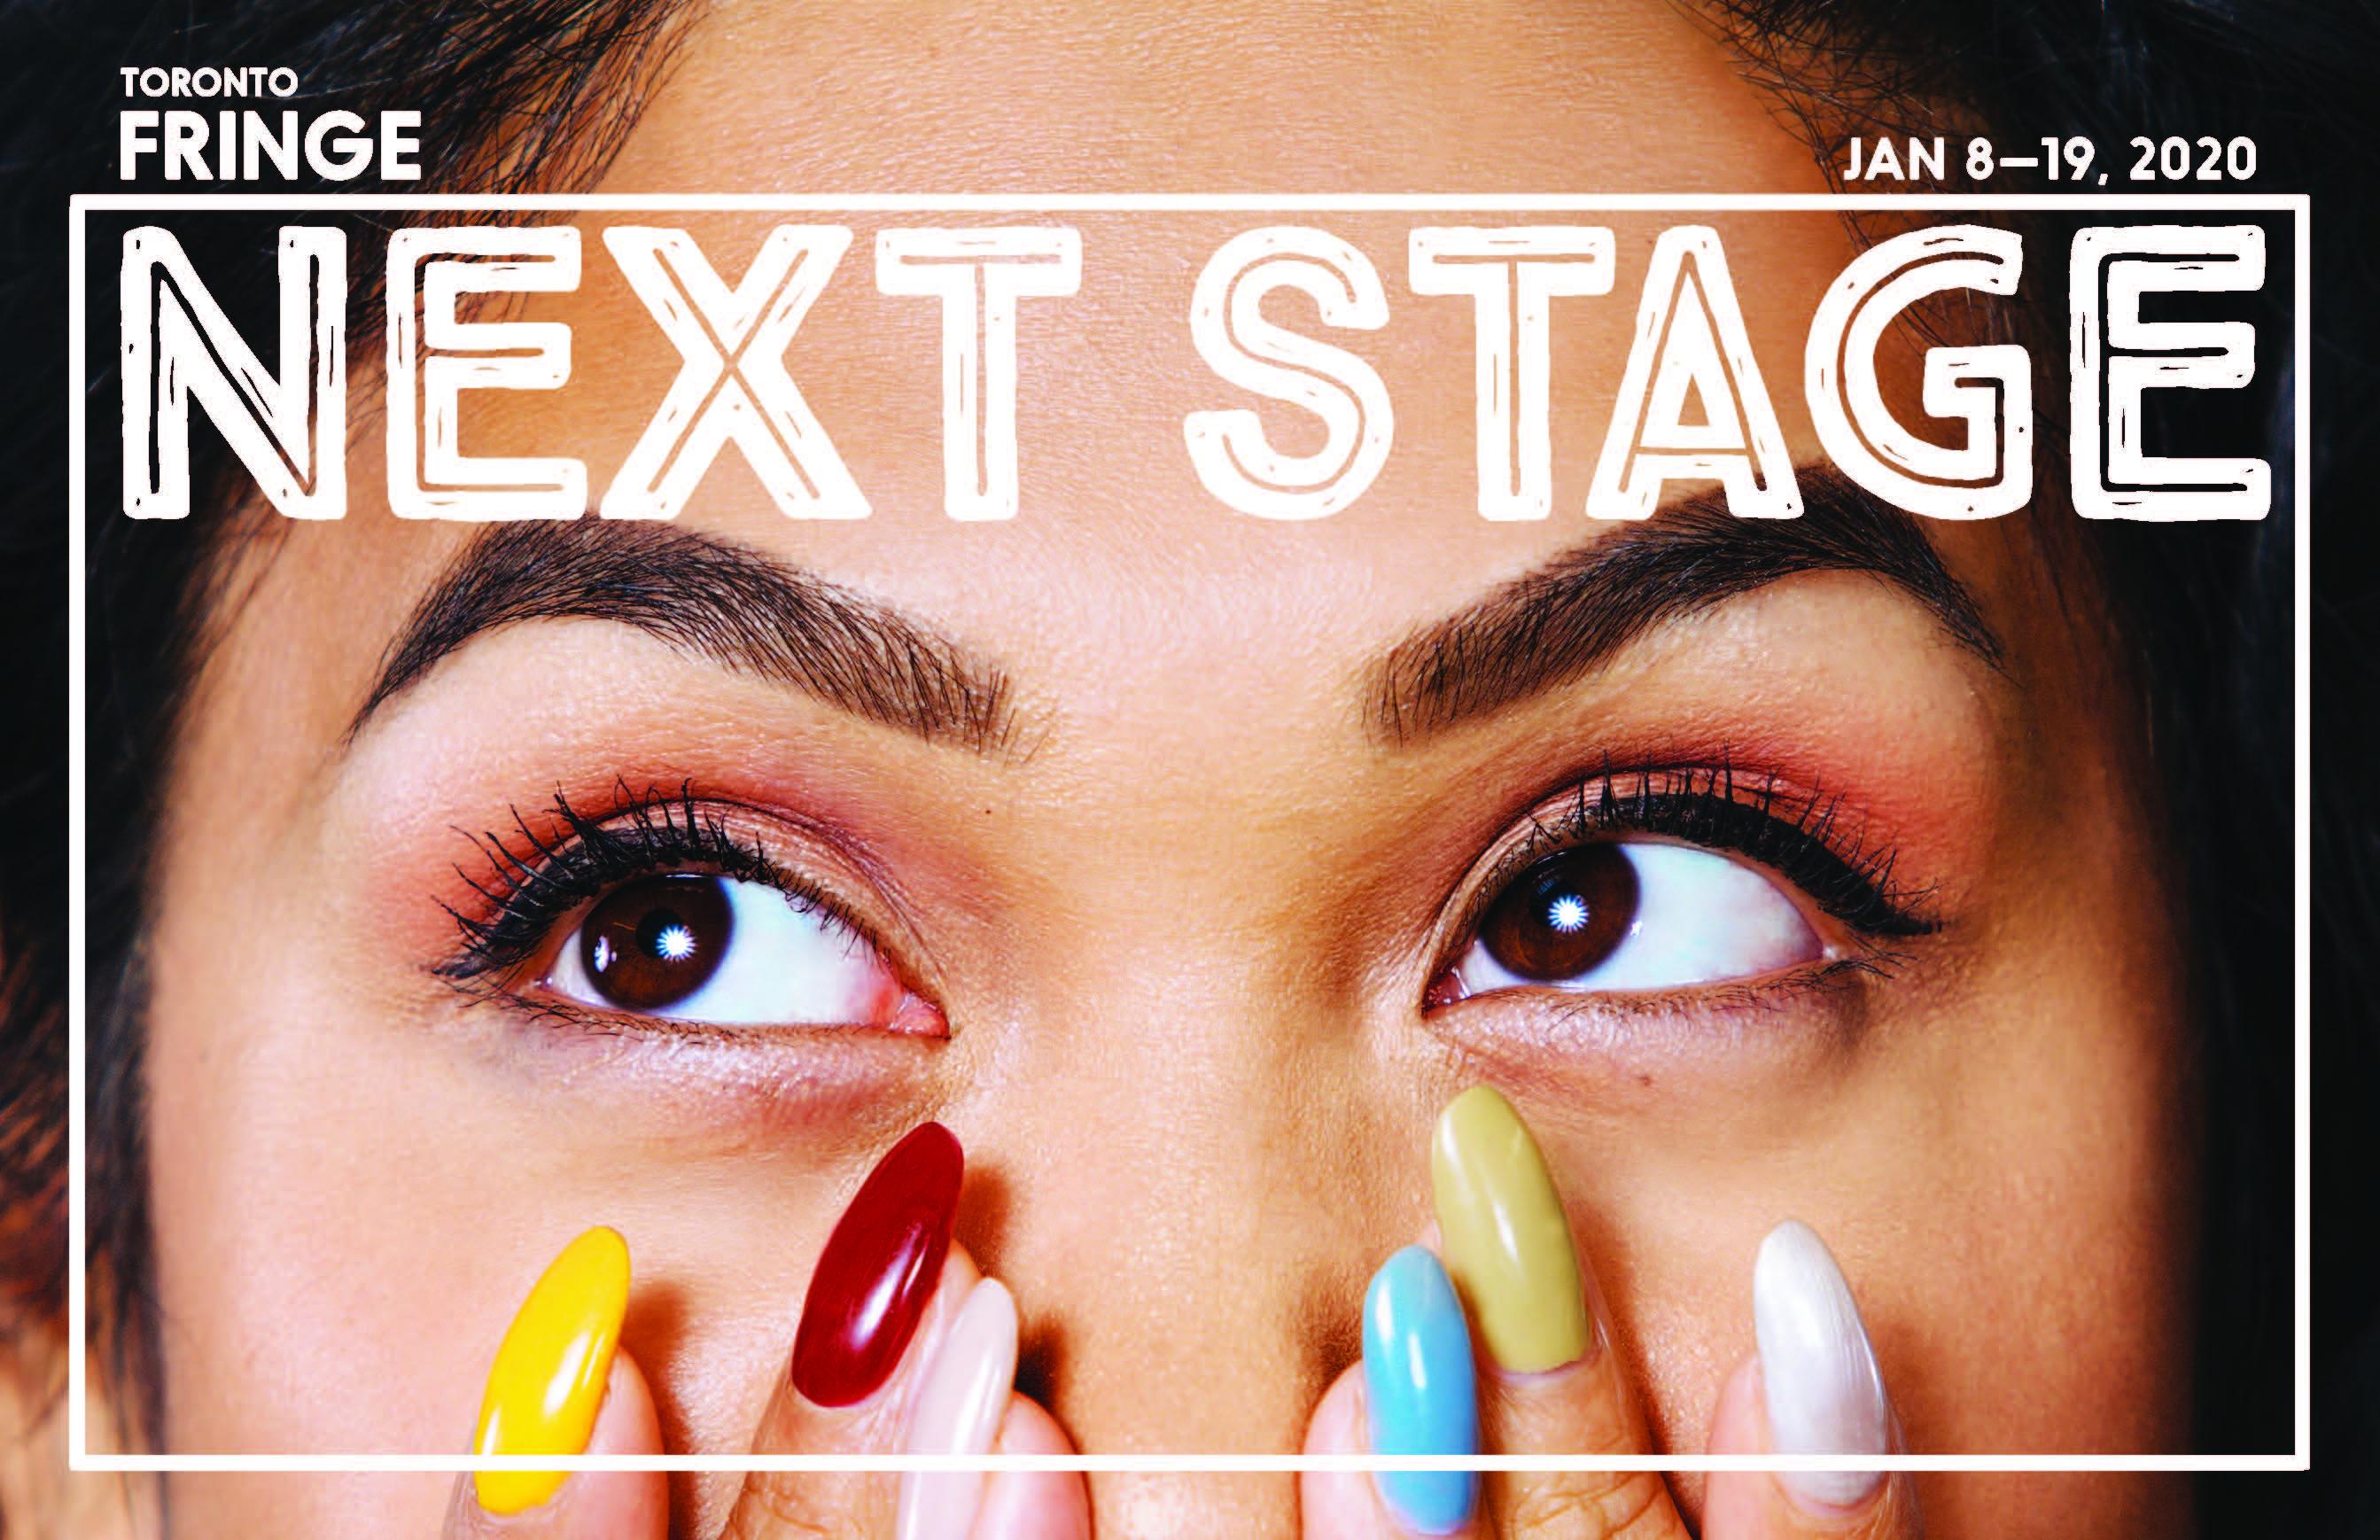 Next Stage Theatre Festival